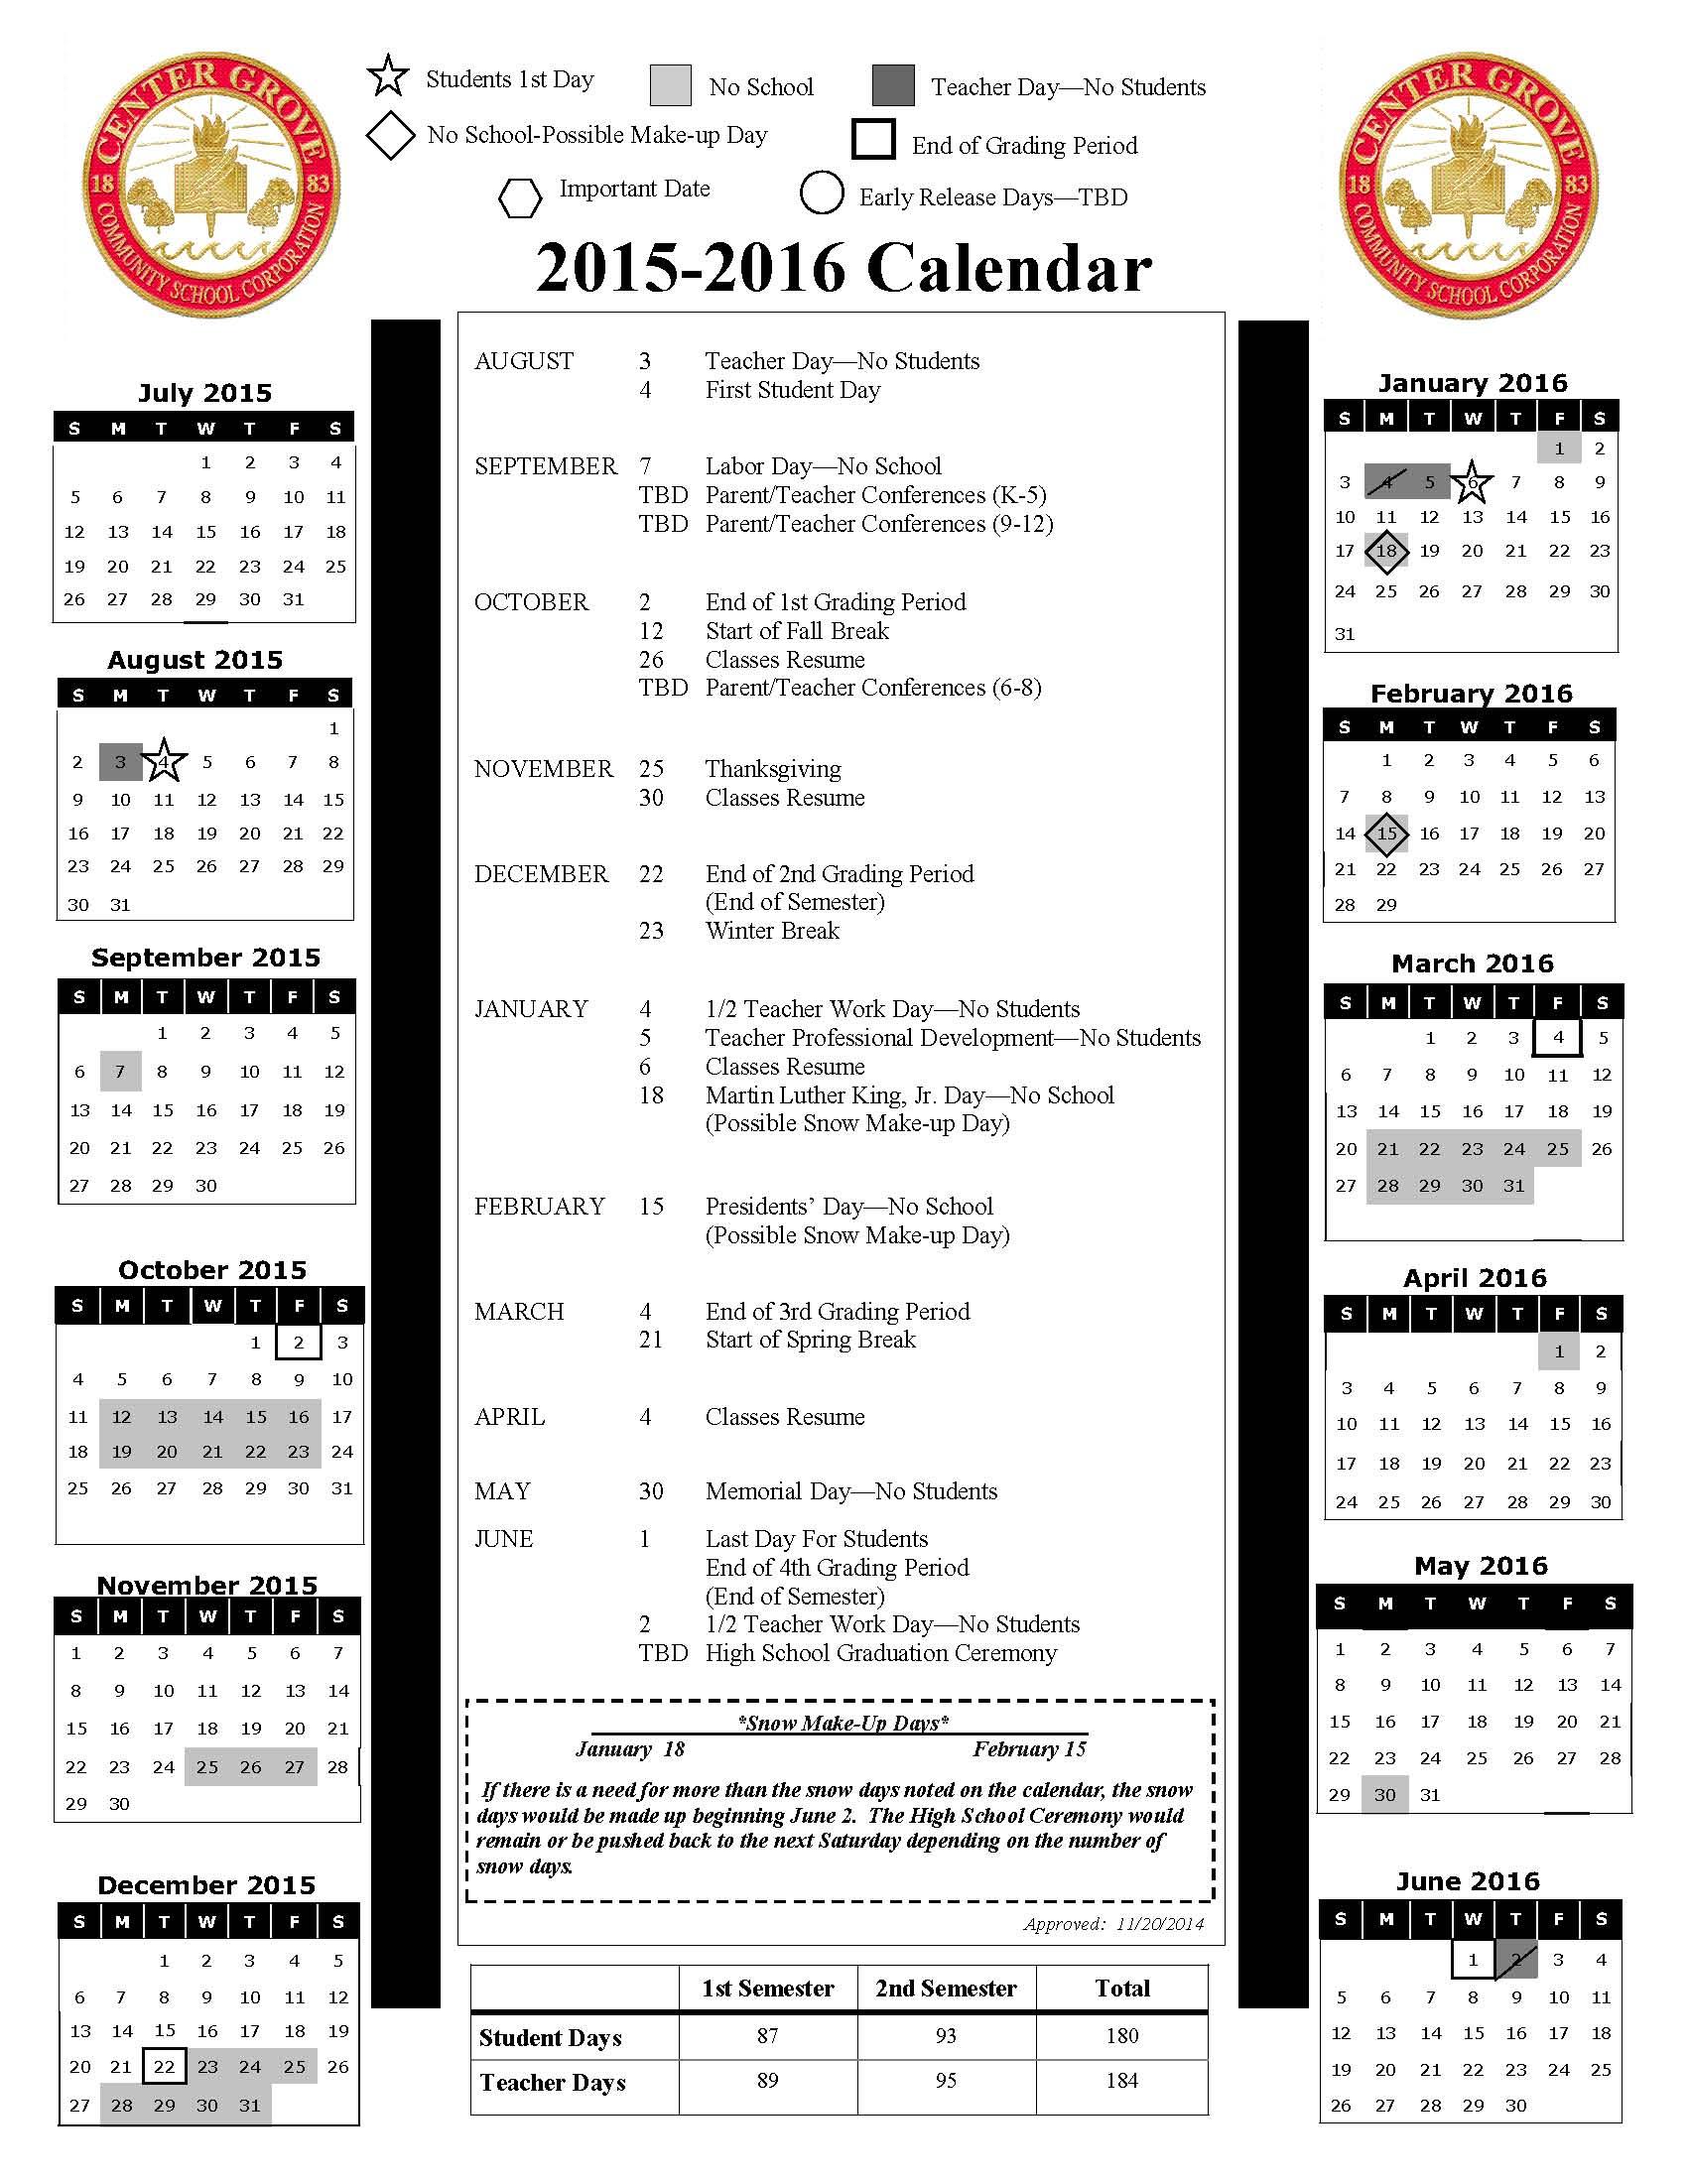 School Calendars / 2015-2016 School Calendar